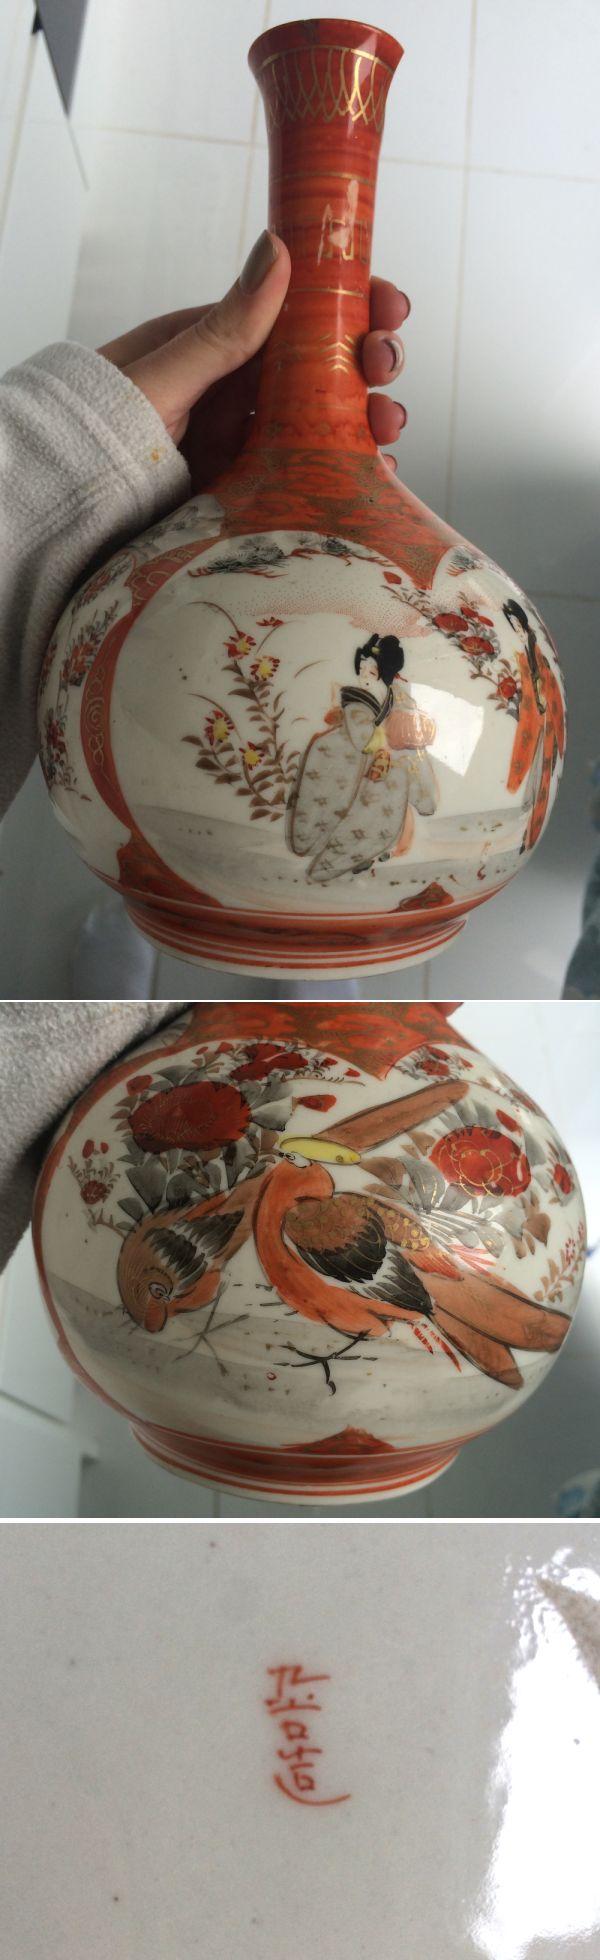 datation Kutani porcelaine azubi vitesse datant Ingolstadt